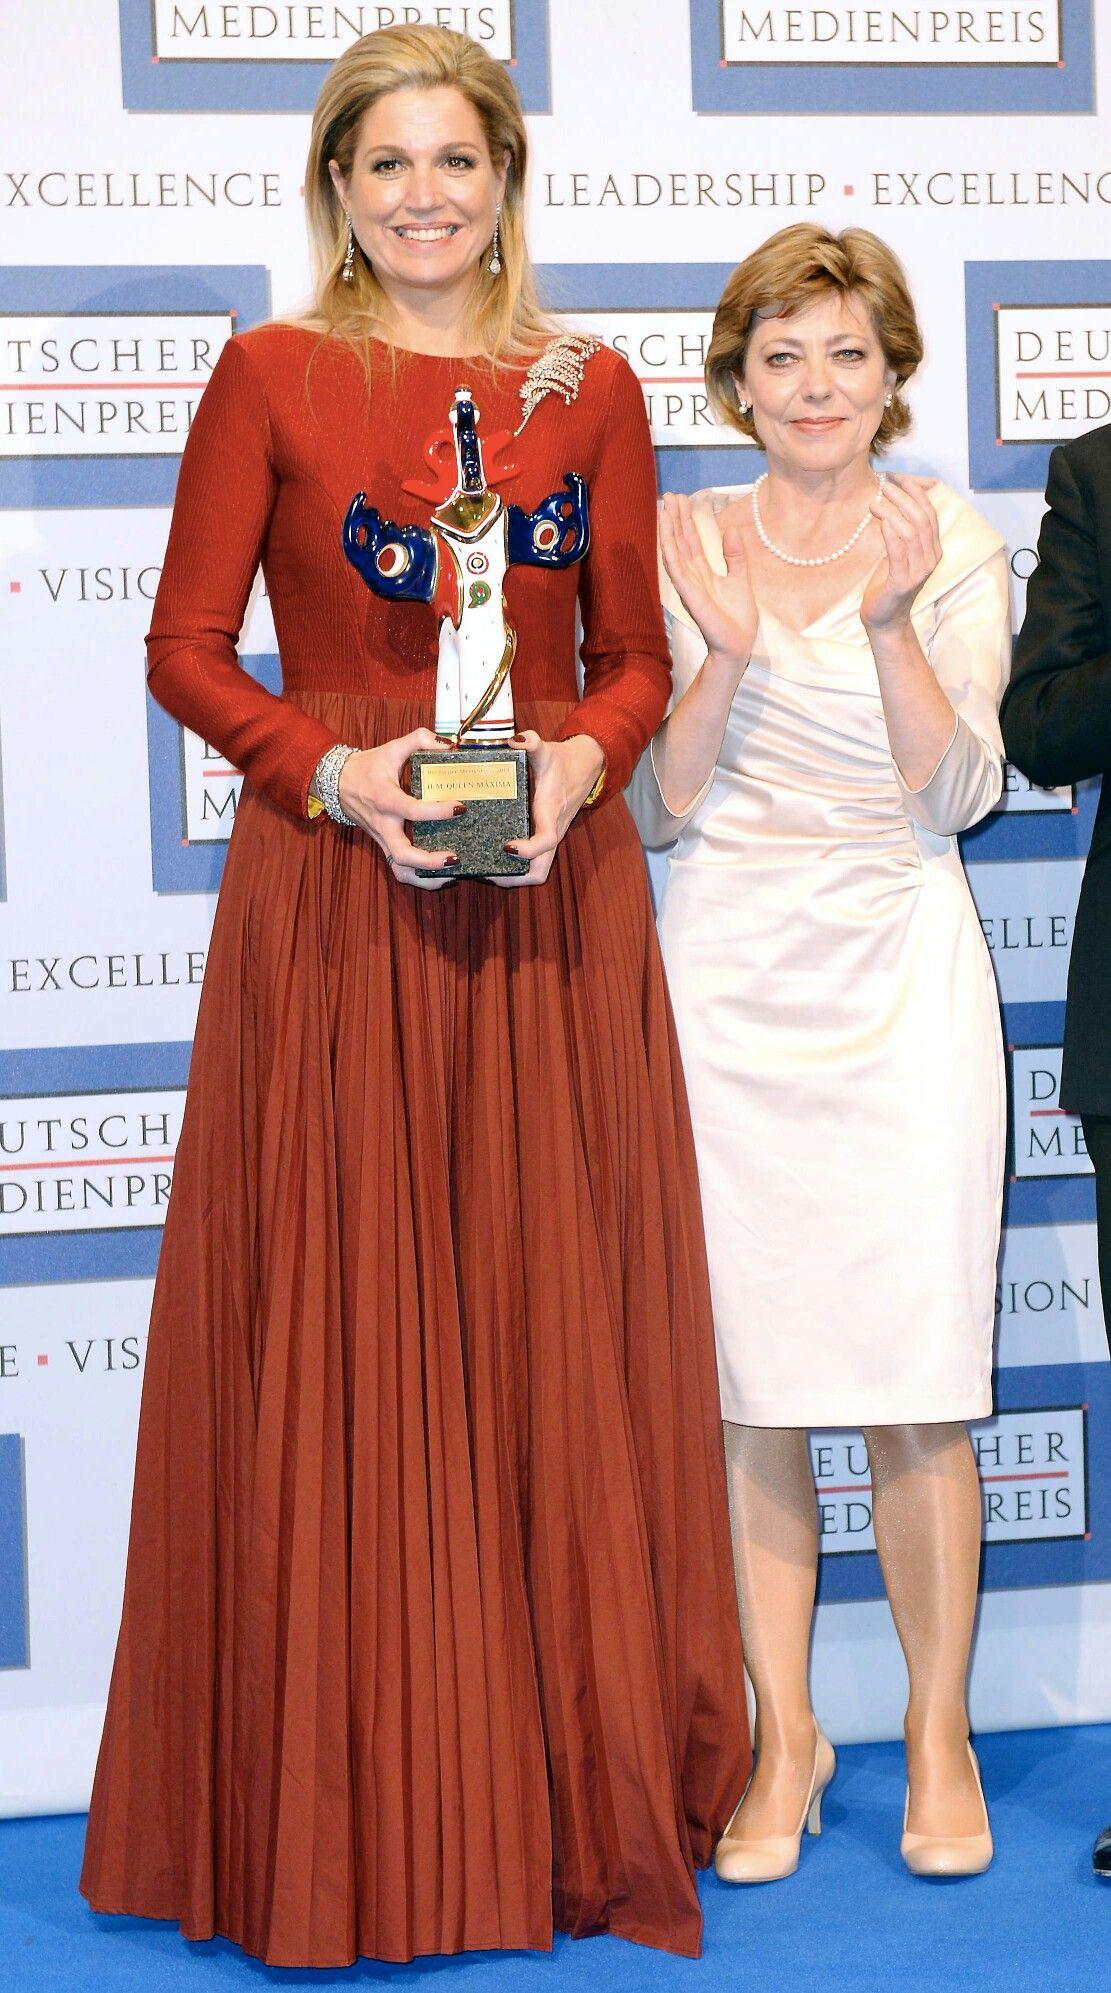 21 March 2014 - King Willem Alexander and Queen Maxima attend Deutscher Medienpreis in Germany